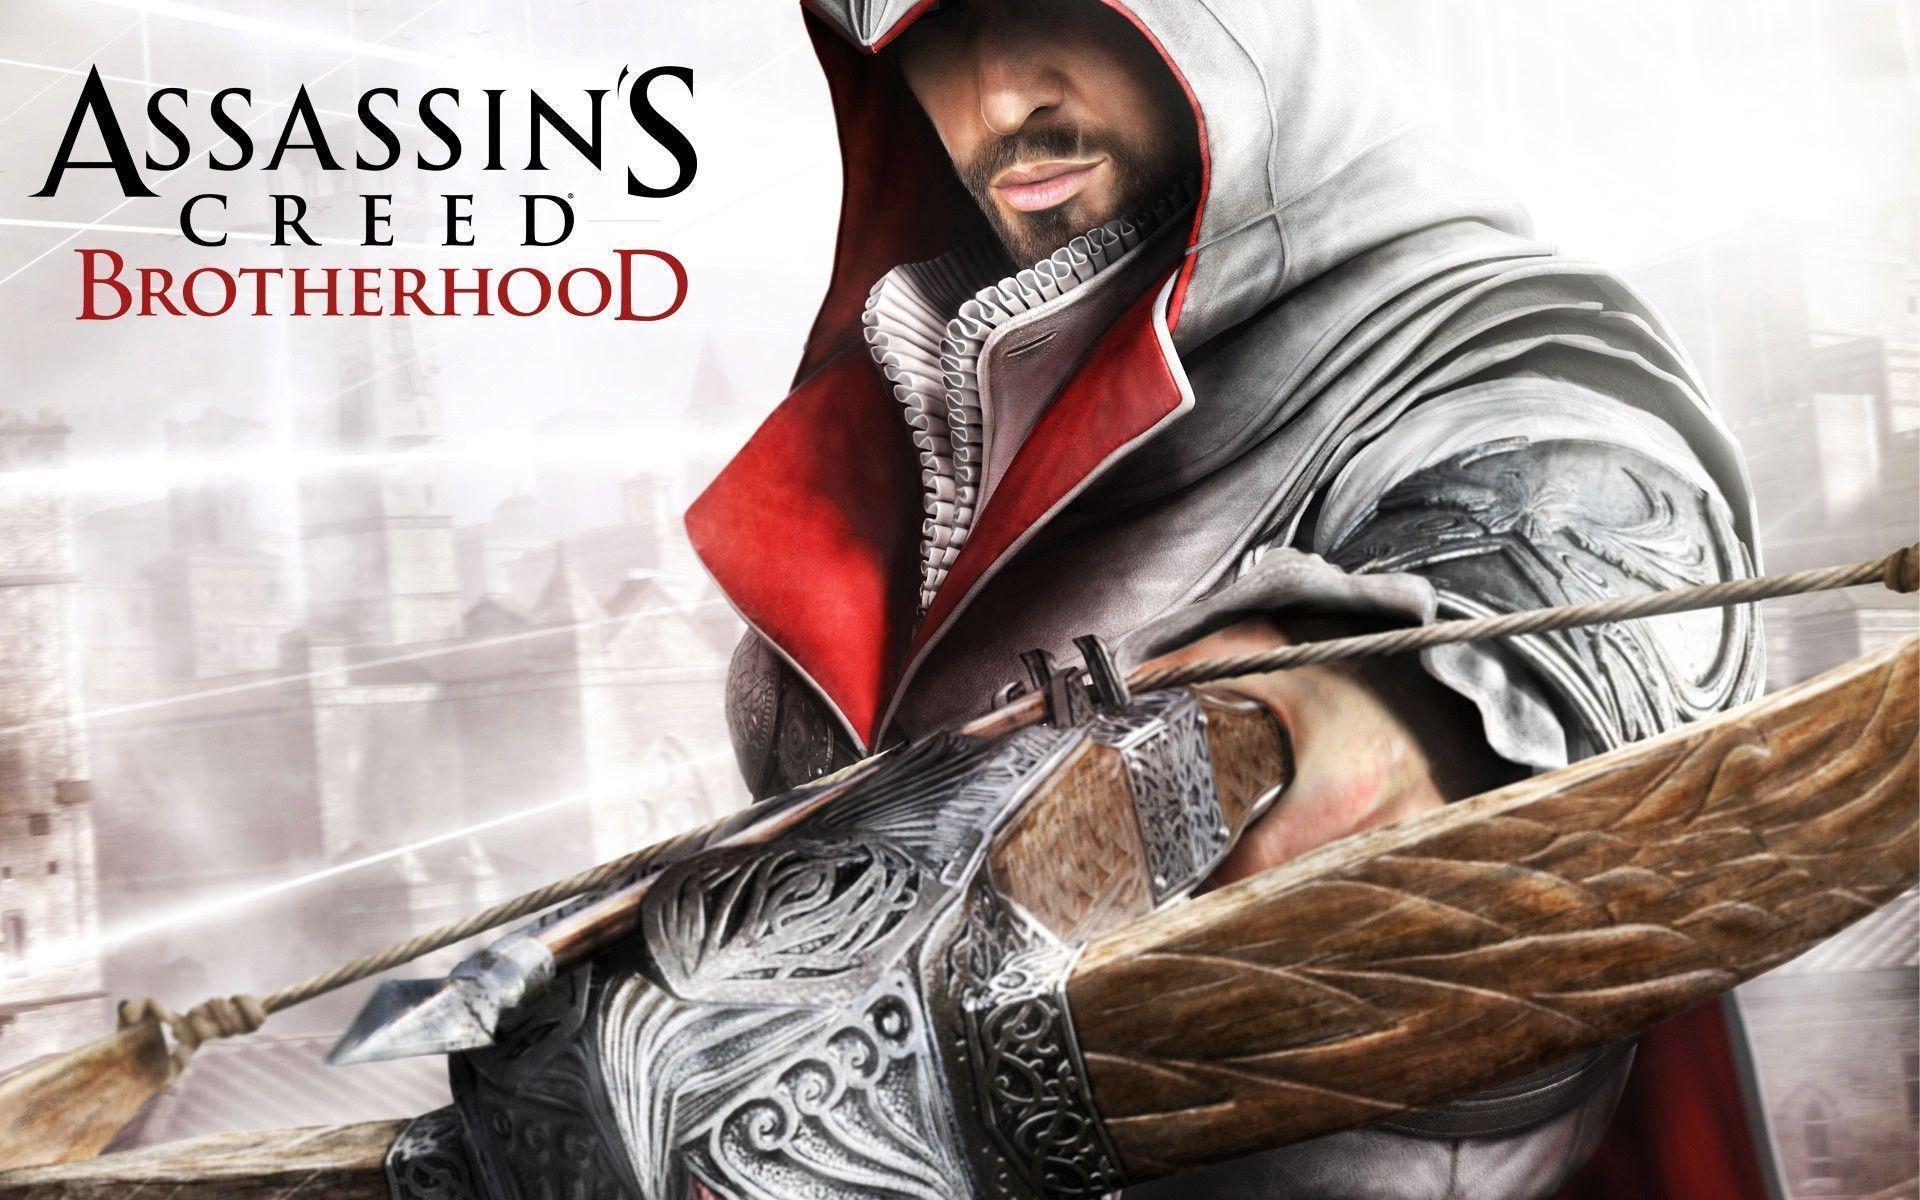 51 Assassin's Creed: Brotherhood Wallpapers   Assassin's Creed ...